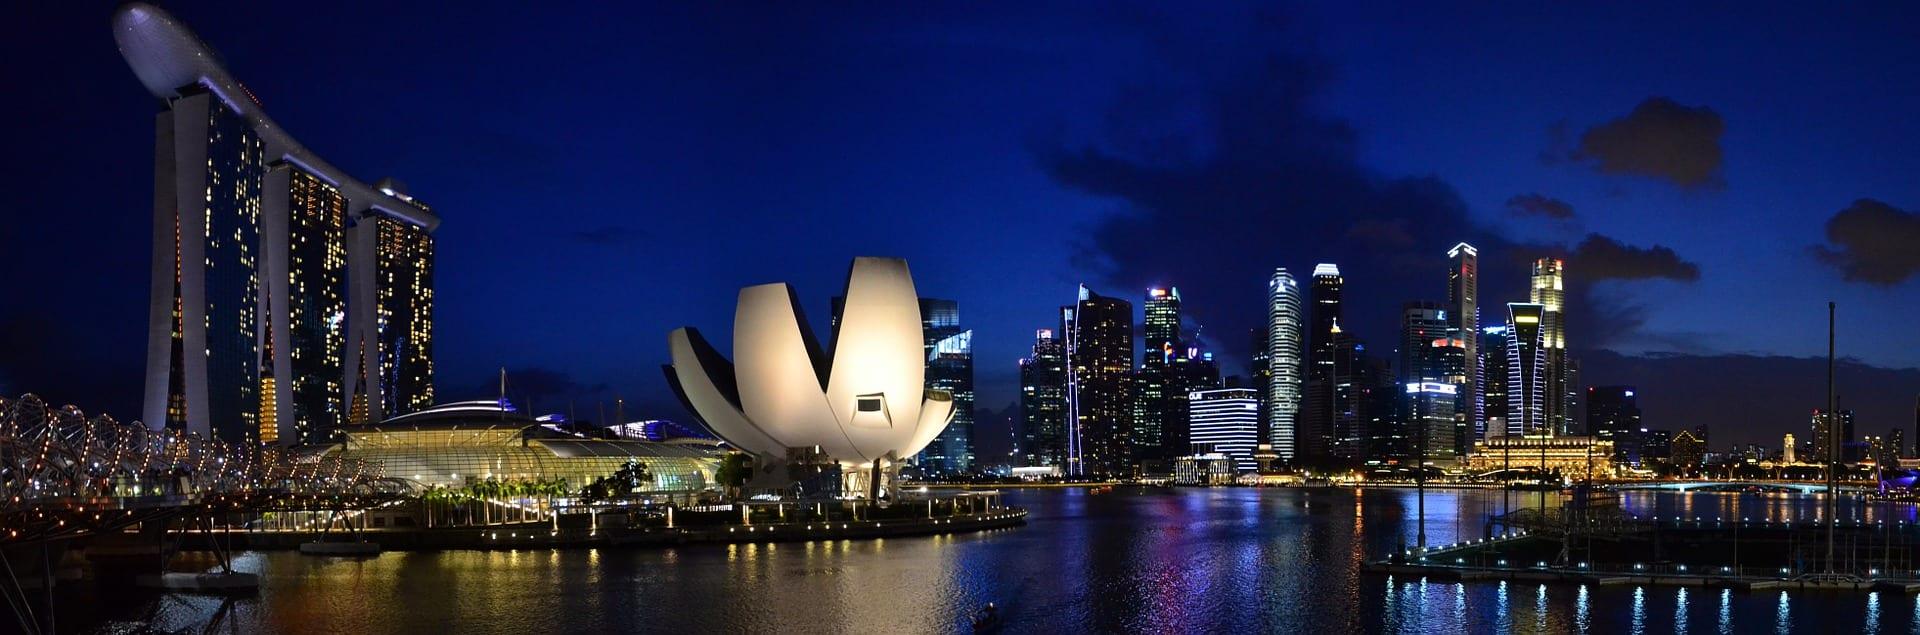 smart cities, inteligentní města